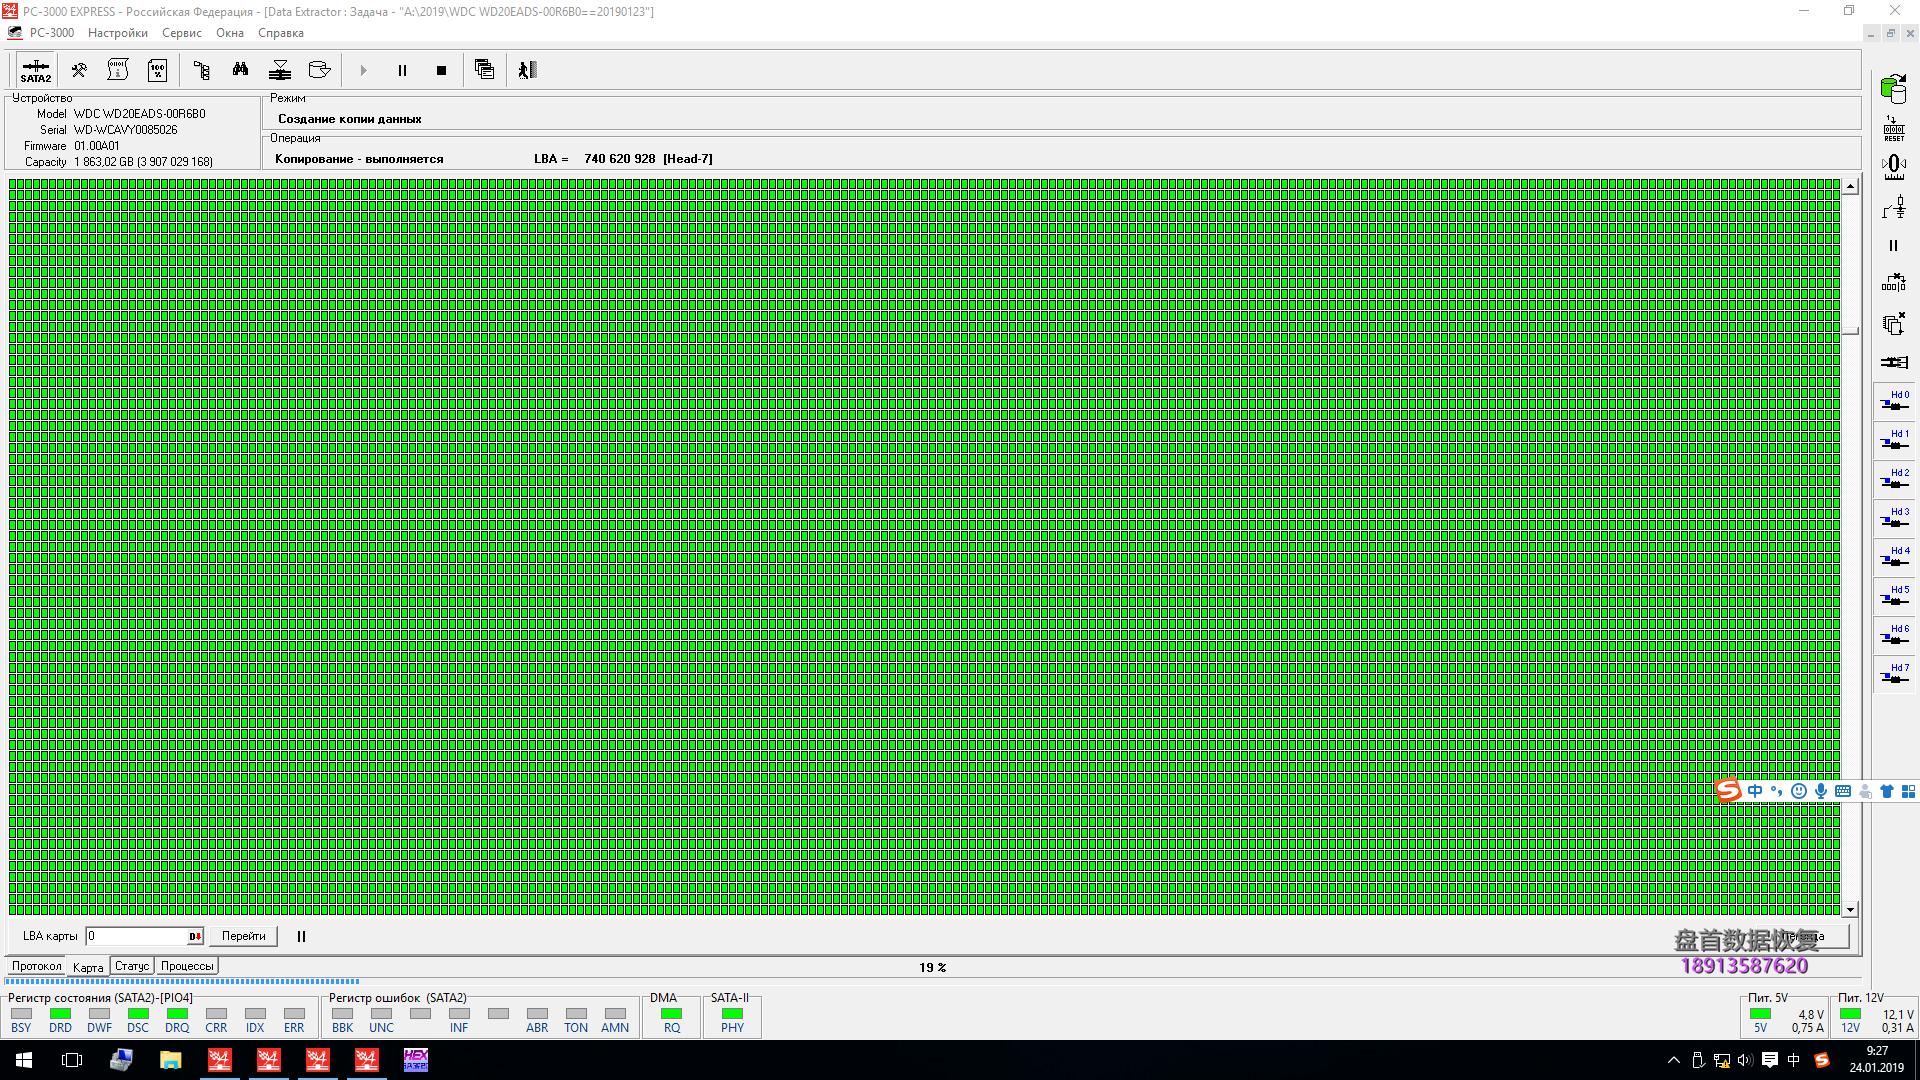 0-22 WD20EADS-00R6B0西部数据2TB台式机硬盘敲盘停转更换磁头开盘数据恢复成功